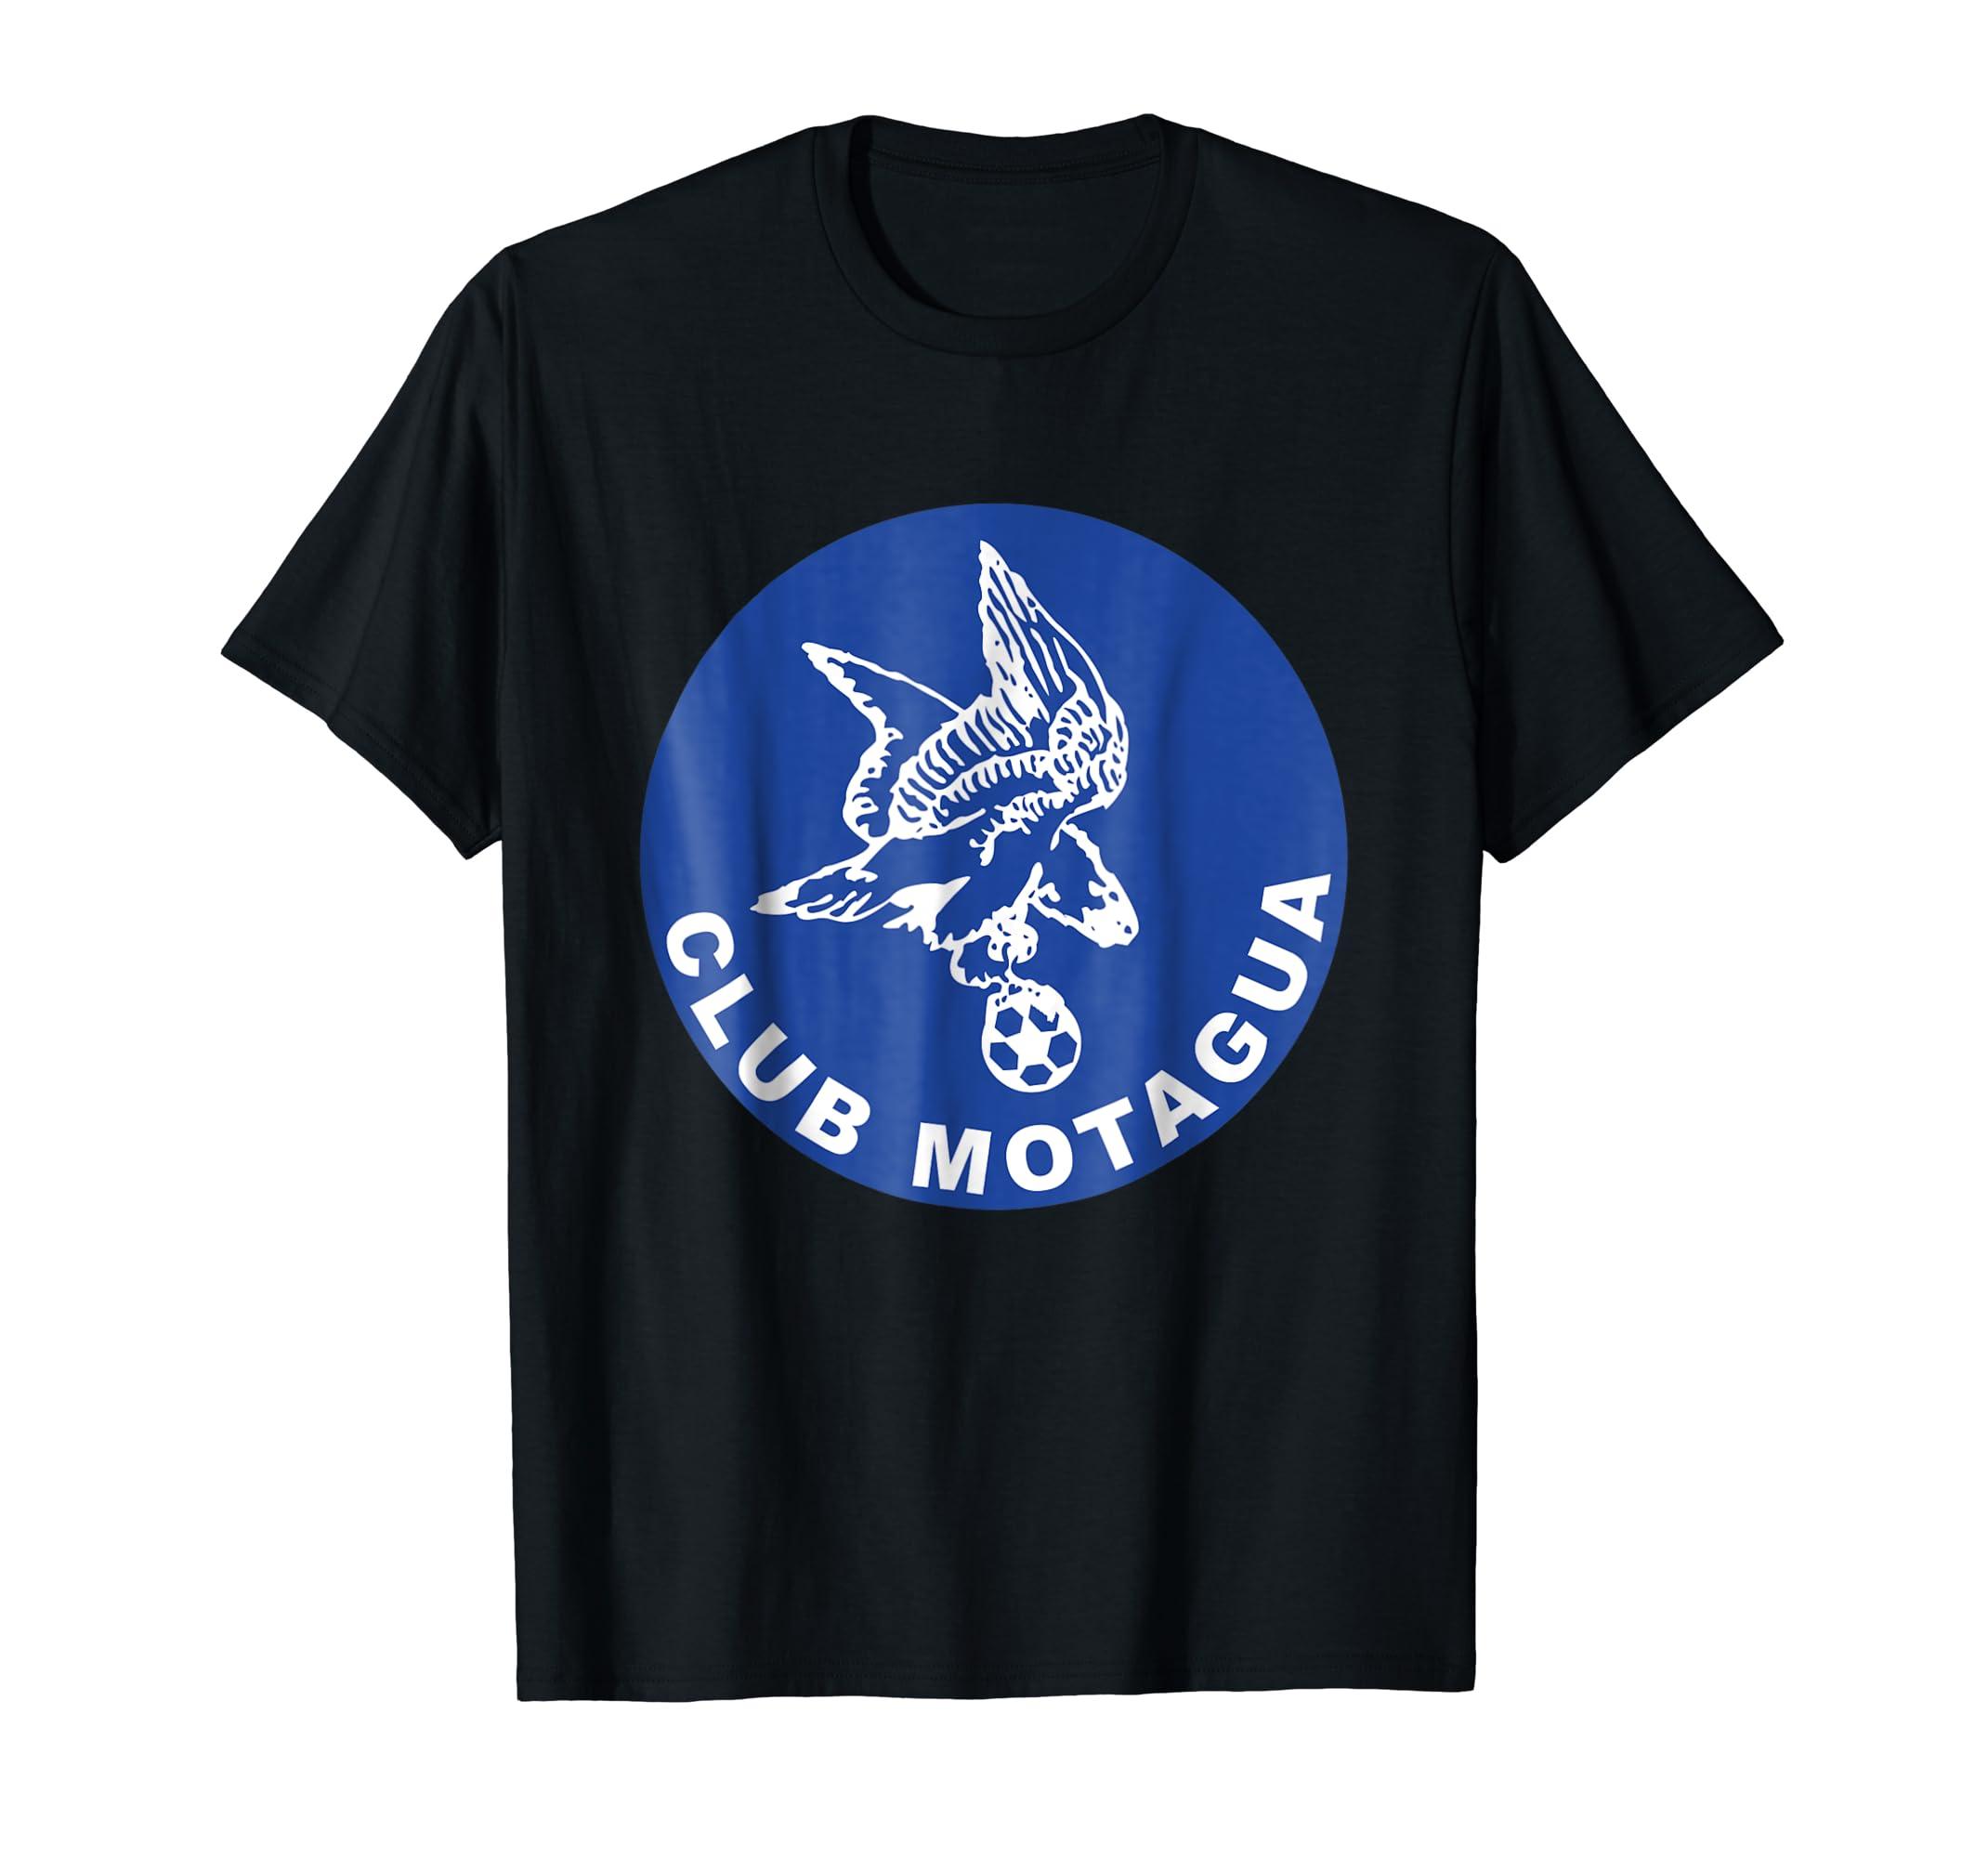 Amazon.com: Camiseta del Motagua - Motagua Shirt - Futbol Hondureno: Clothing